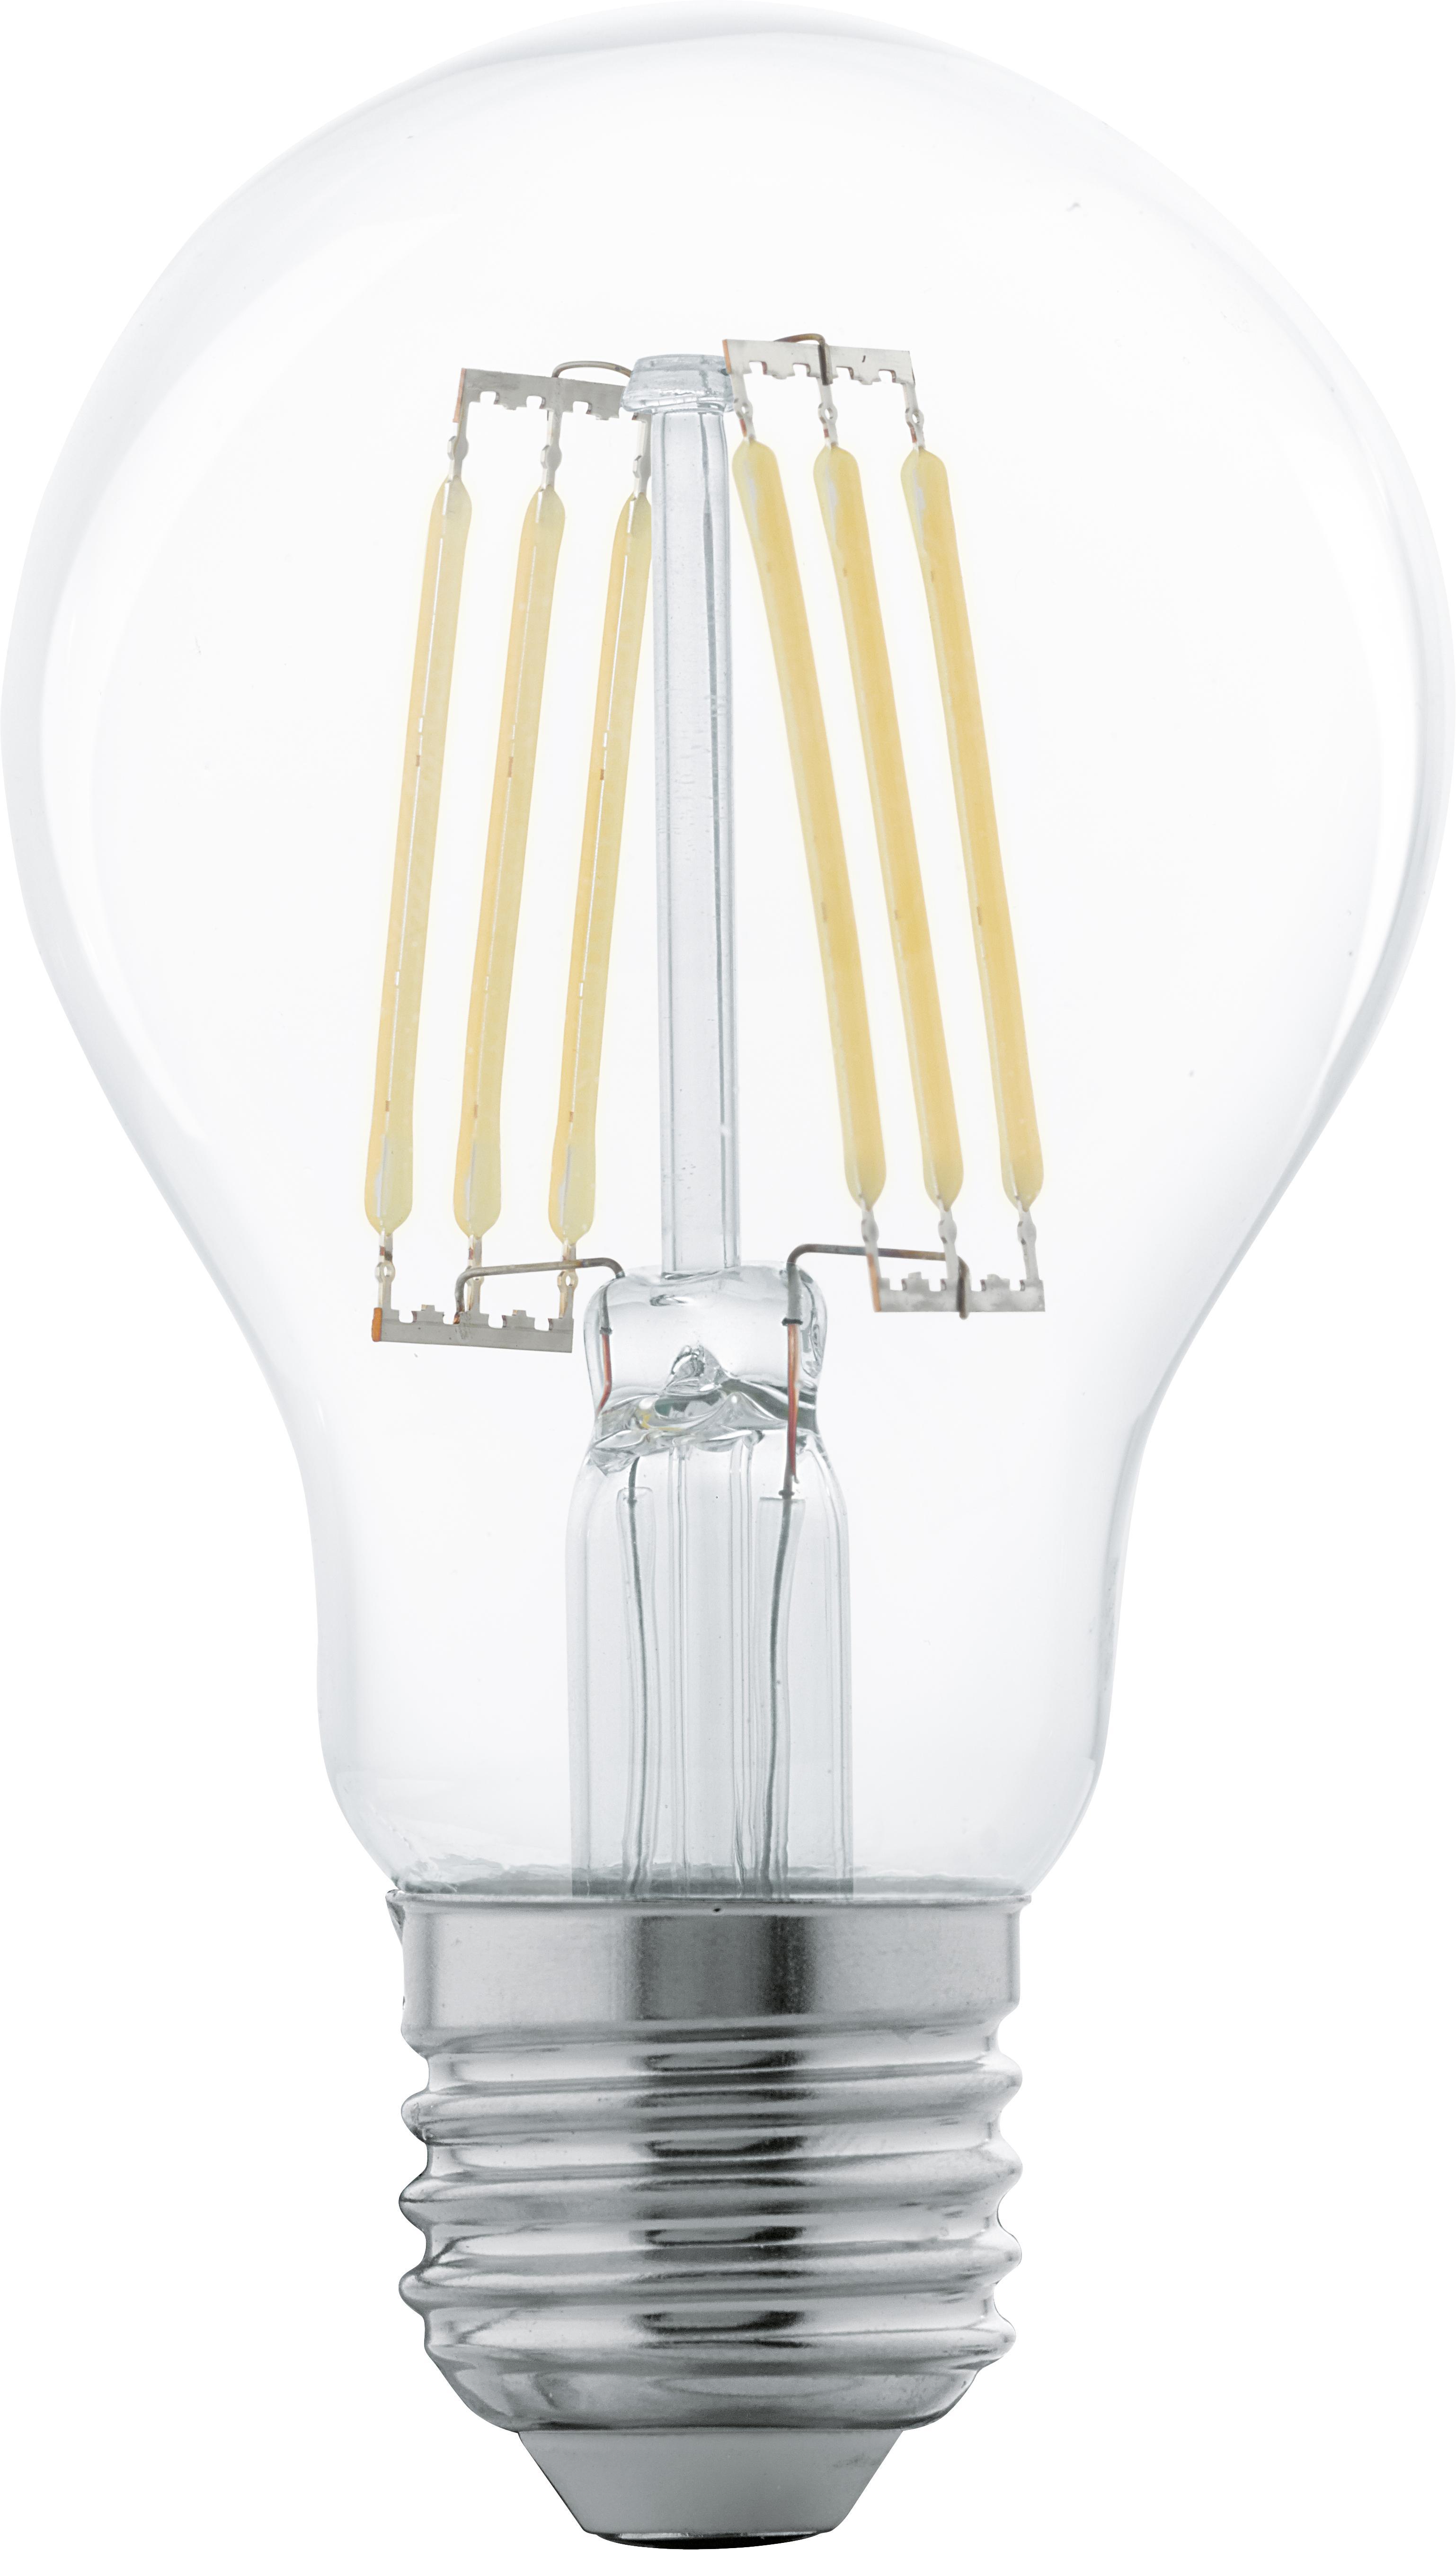 Lampadina a LED Cord (E27 / 6Watt) 5 pz, Lampadina: vetro, Trasparente, Ø 6 x Alt. 10 cm